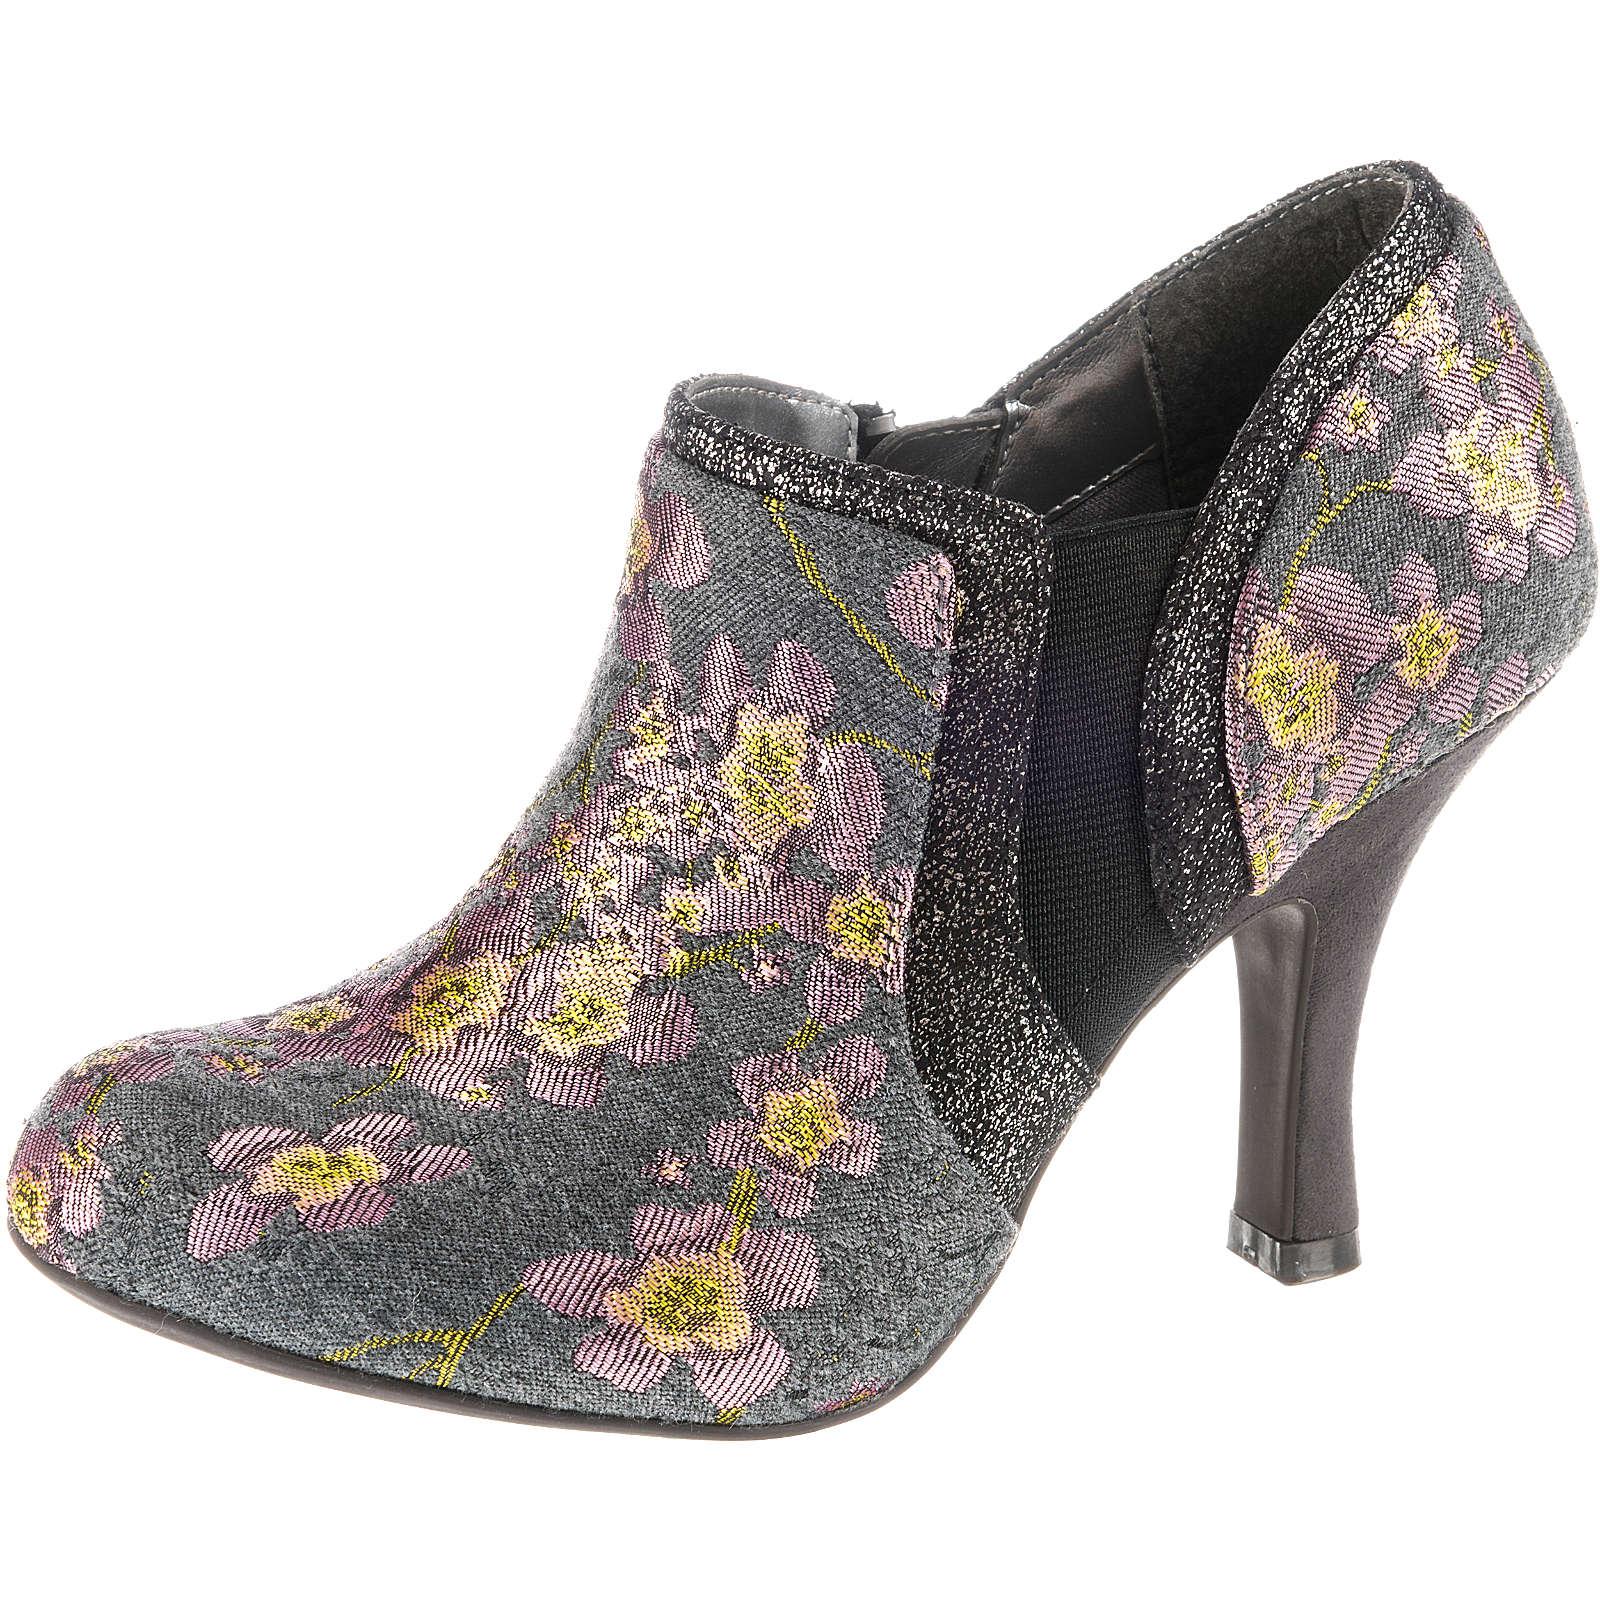 Ruby Shoo Ankle Boots grau Damen Gr. 42